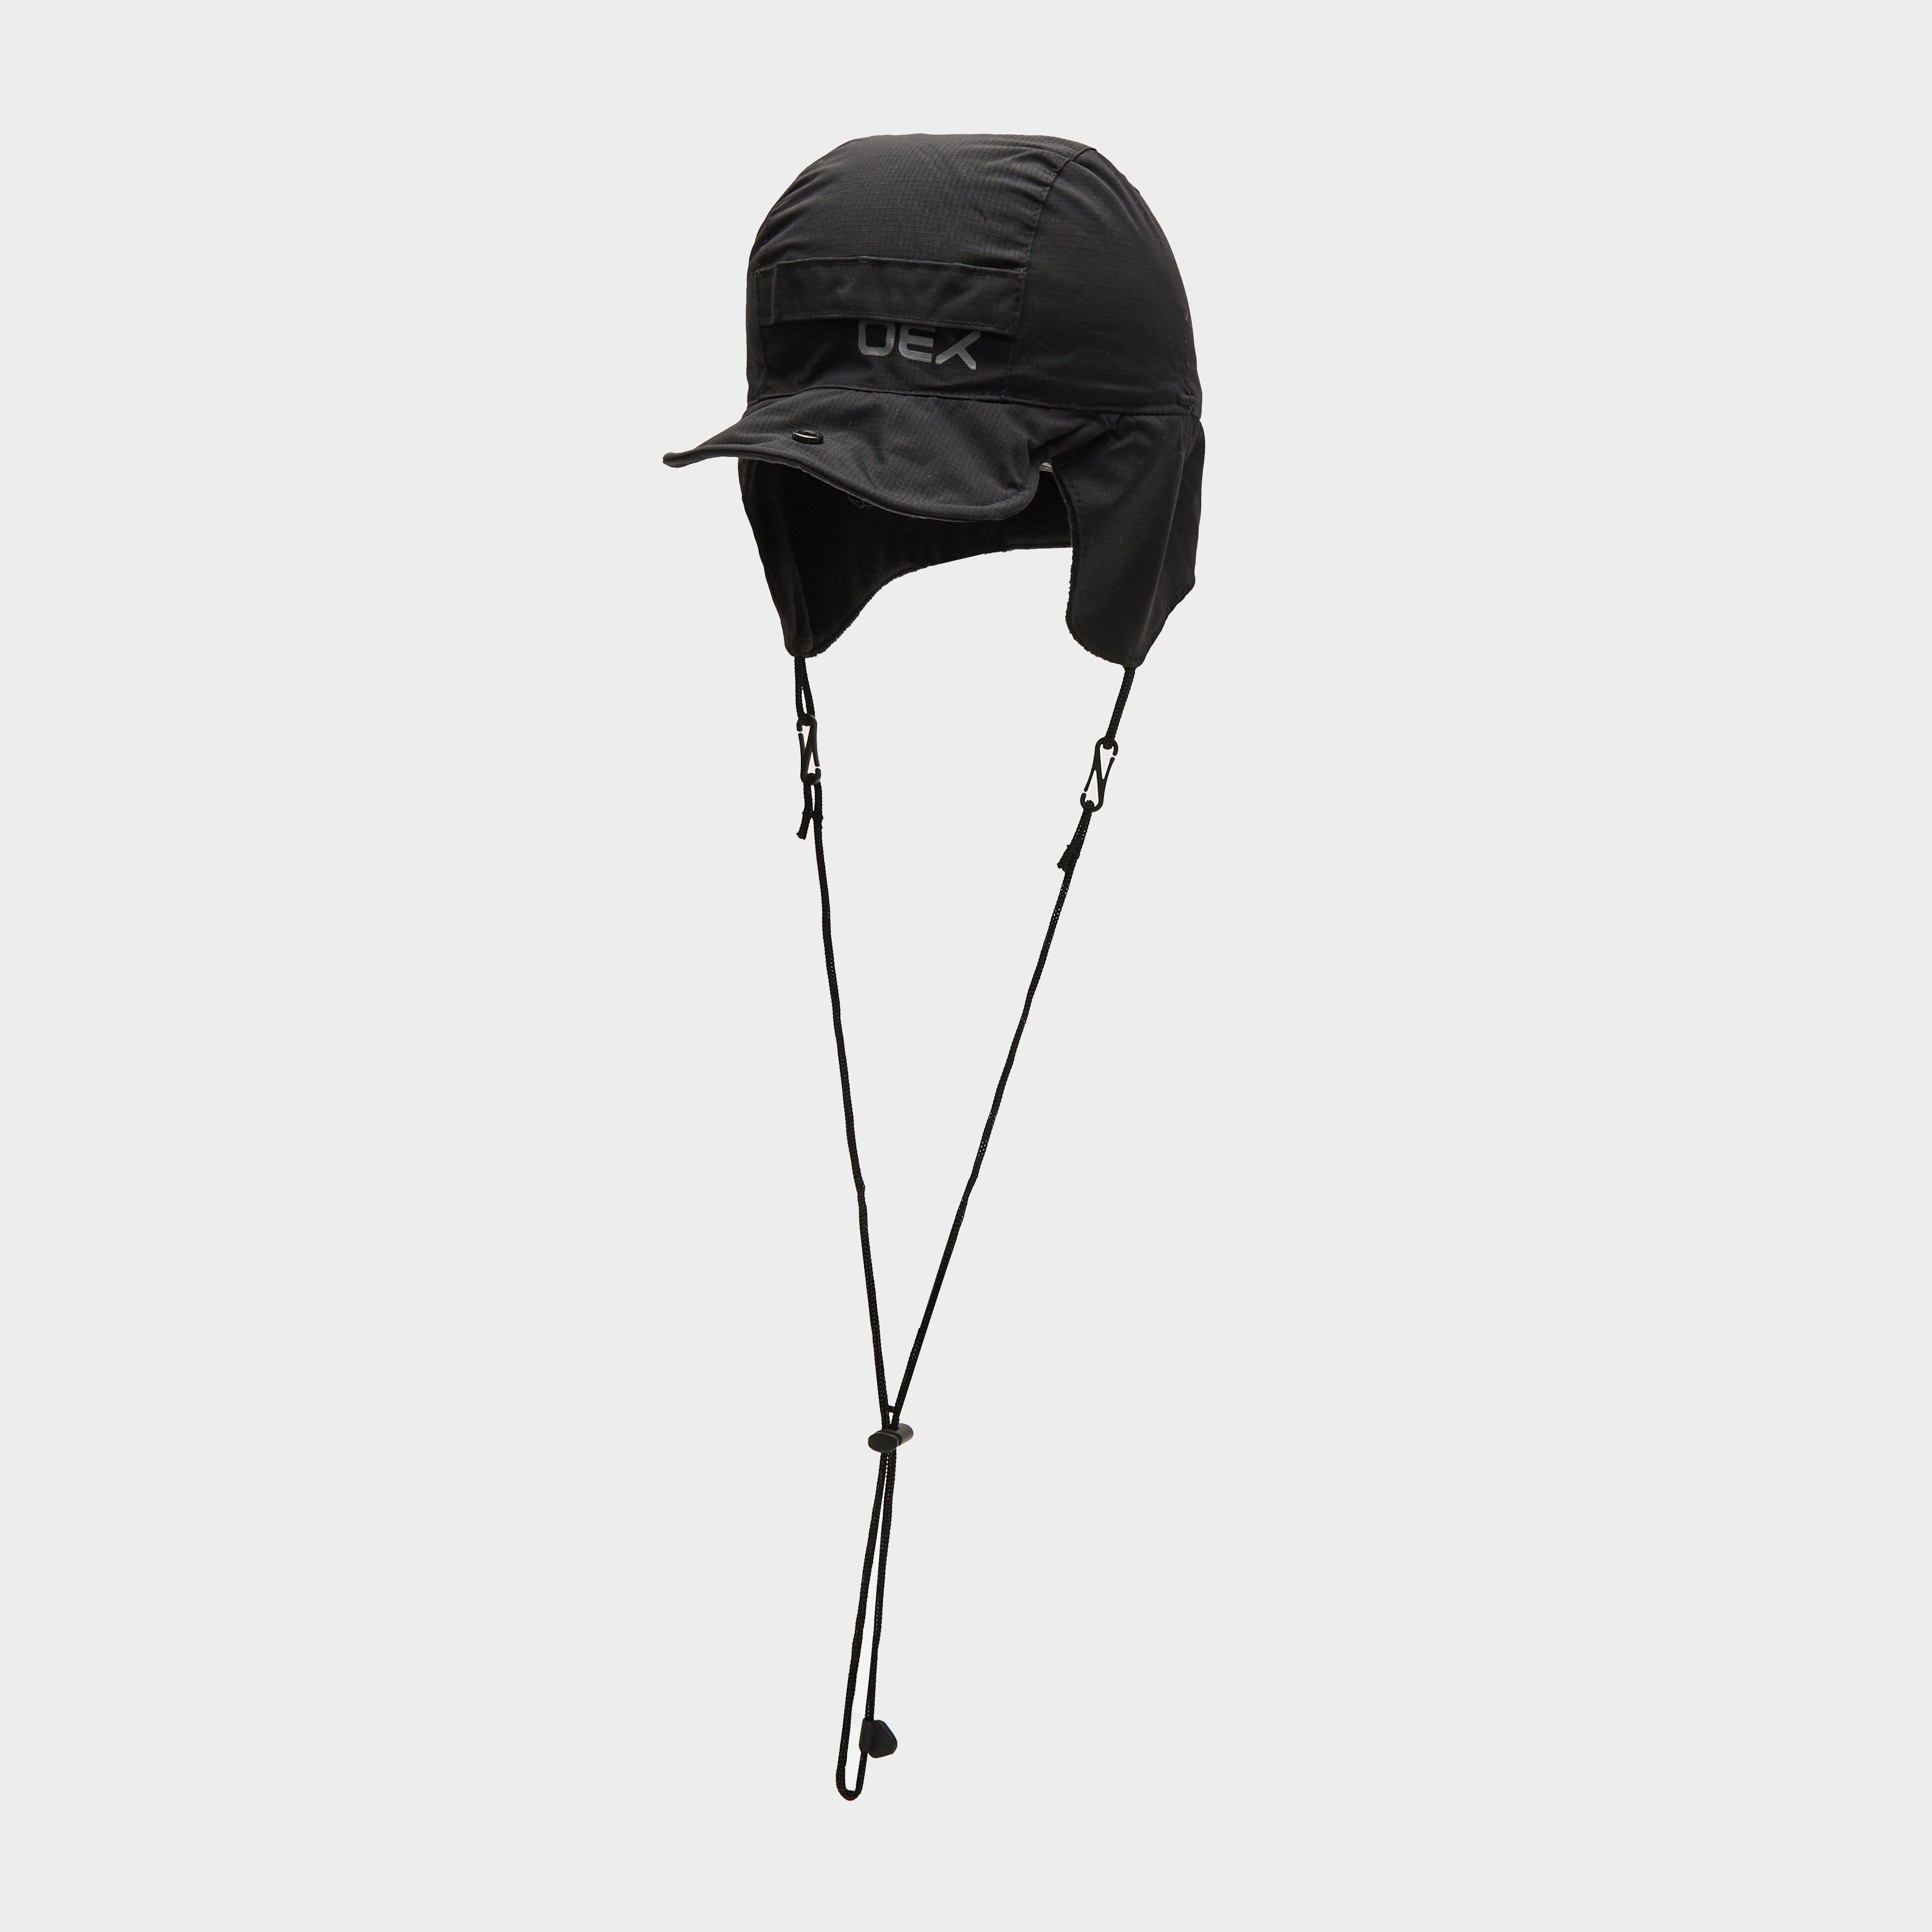 Oex Oex Halley Mountain Cap (Unisex) - Black, Black